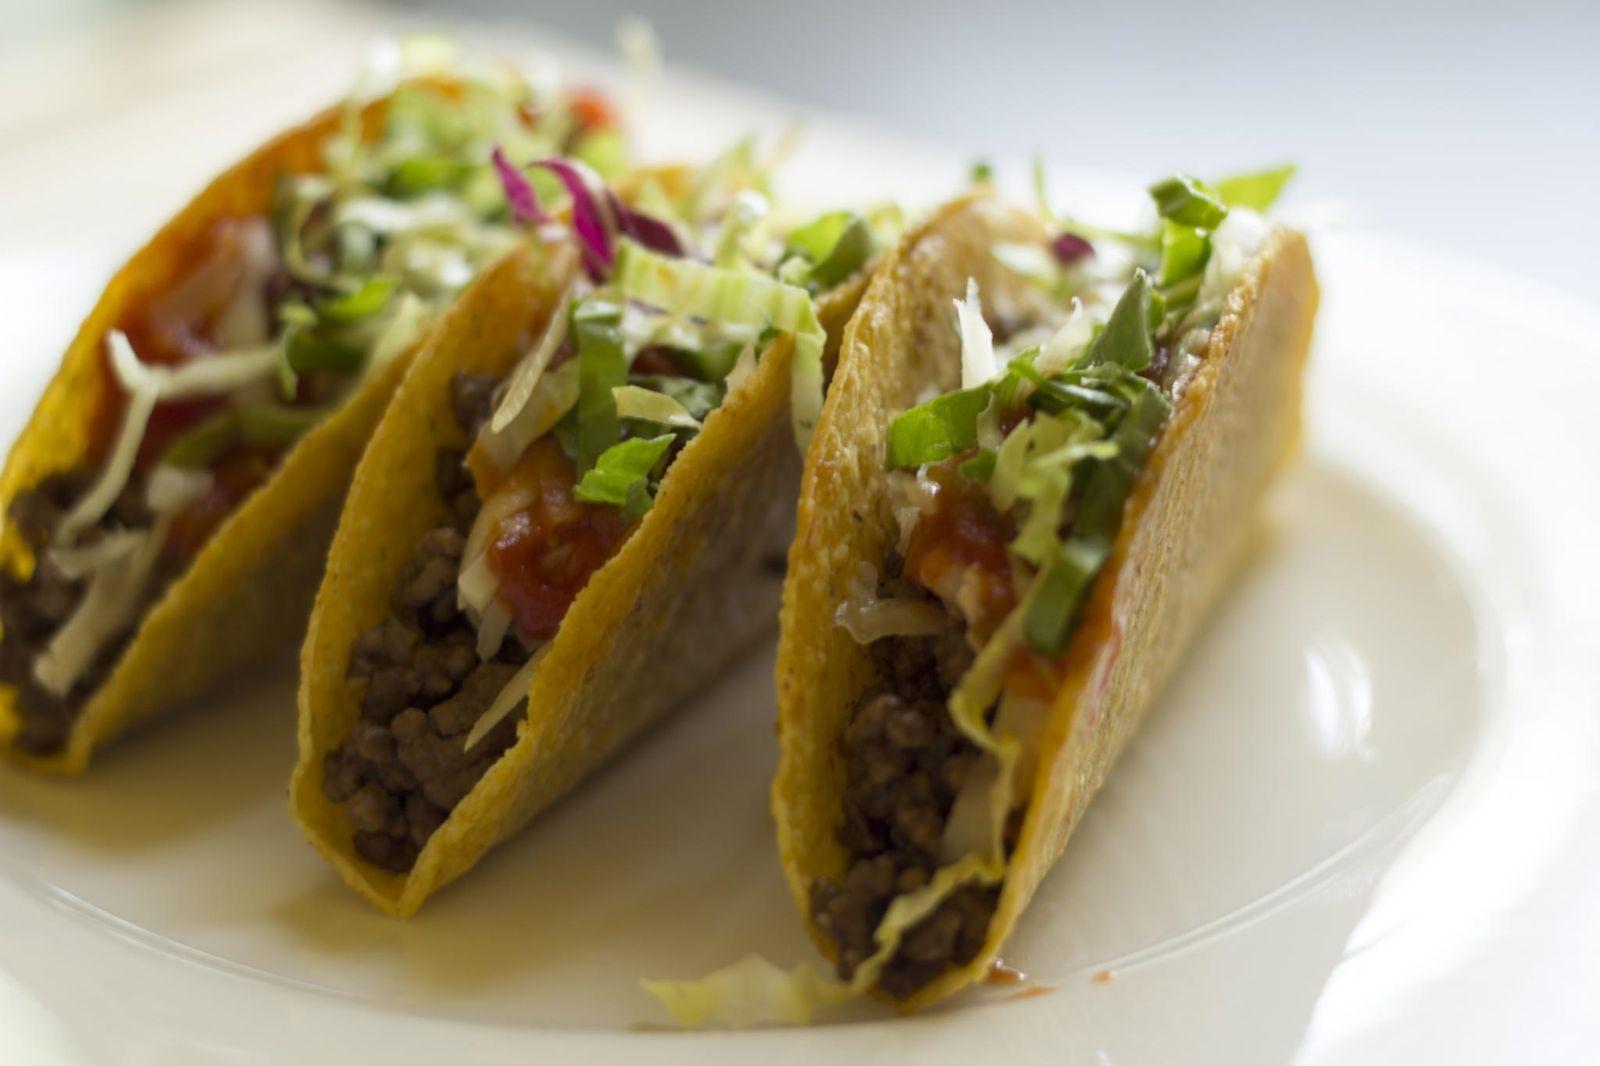 b3bb7c1b2f7b695586208ec96e7352ba - Ricette Tacos